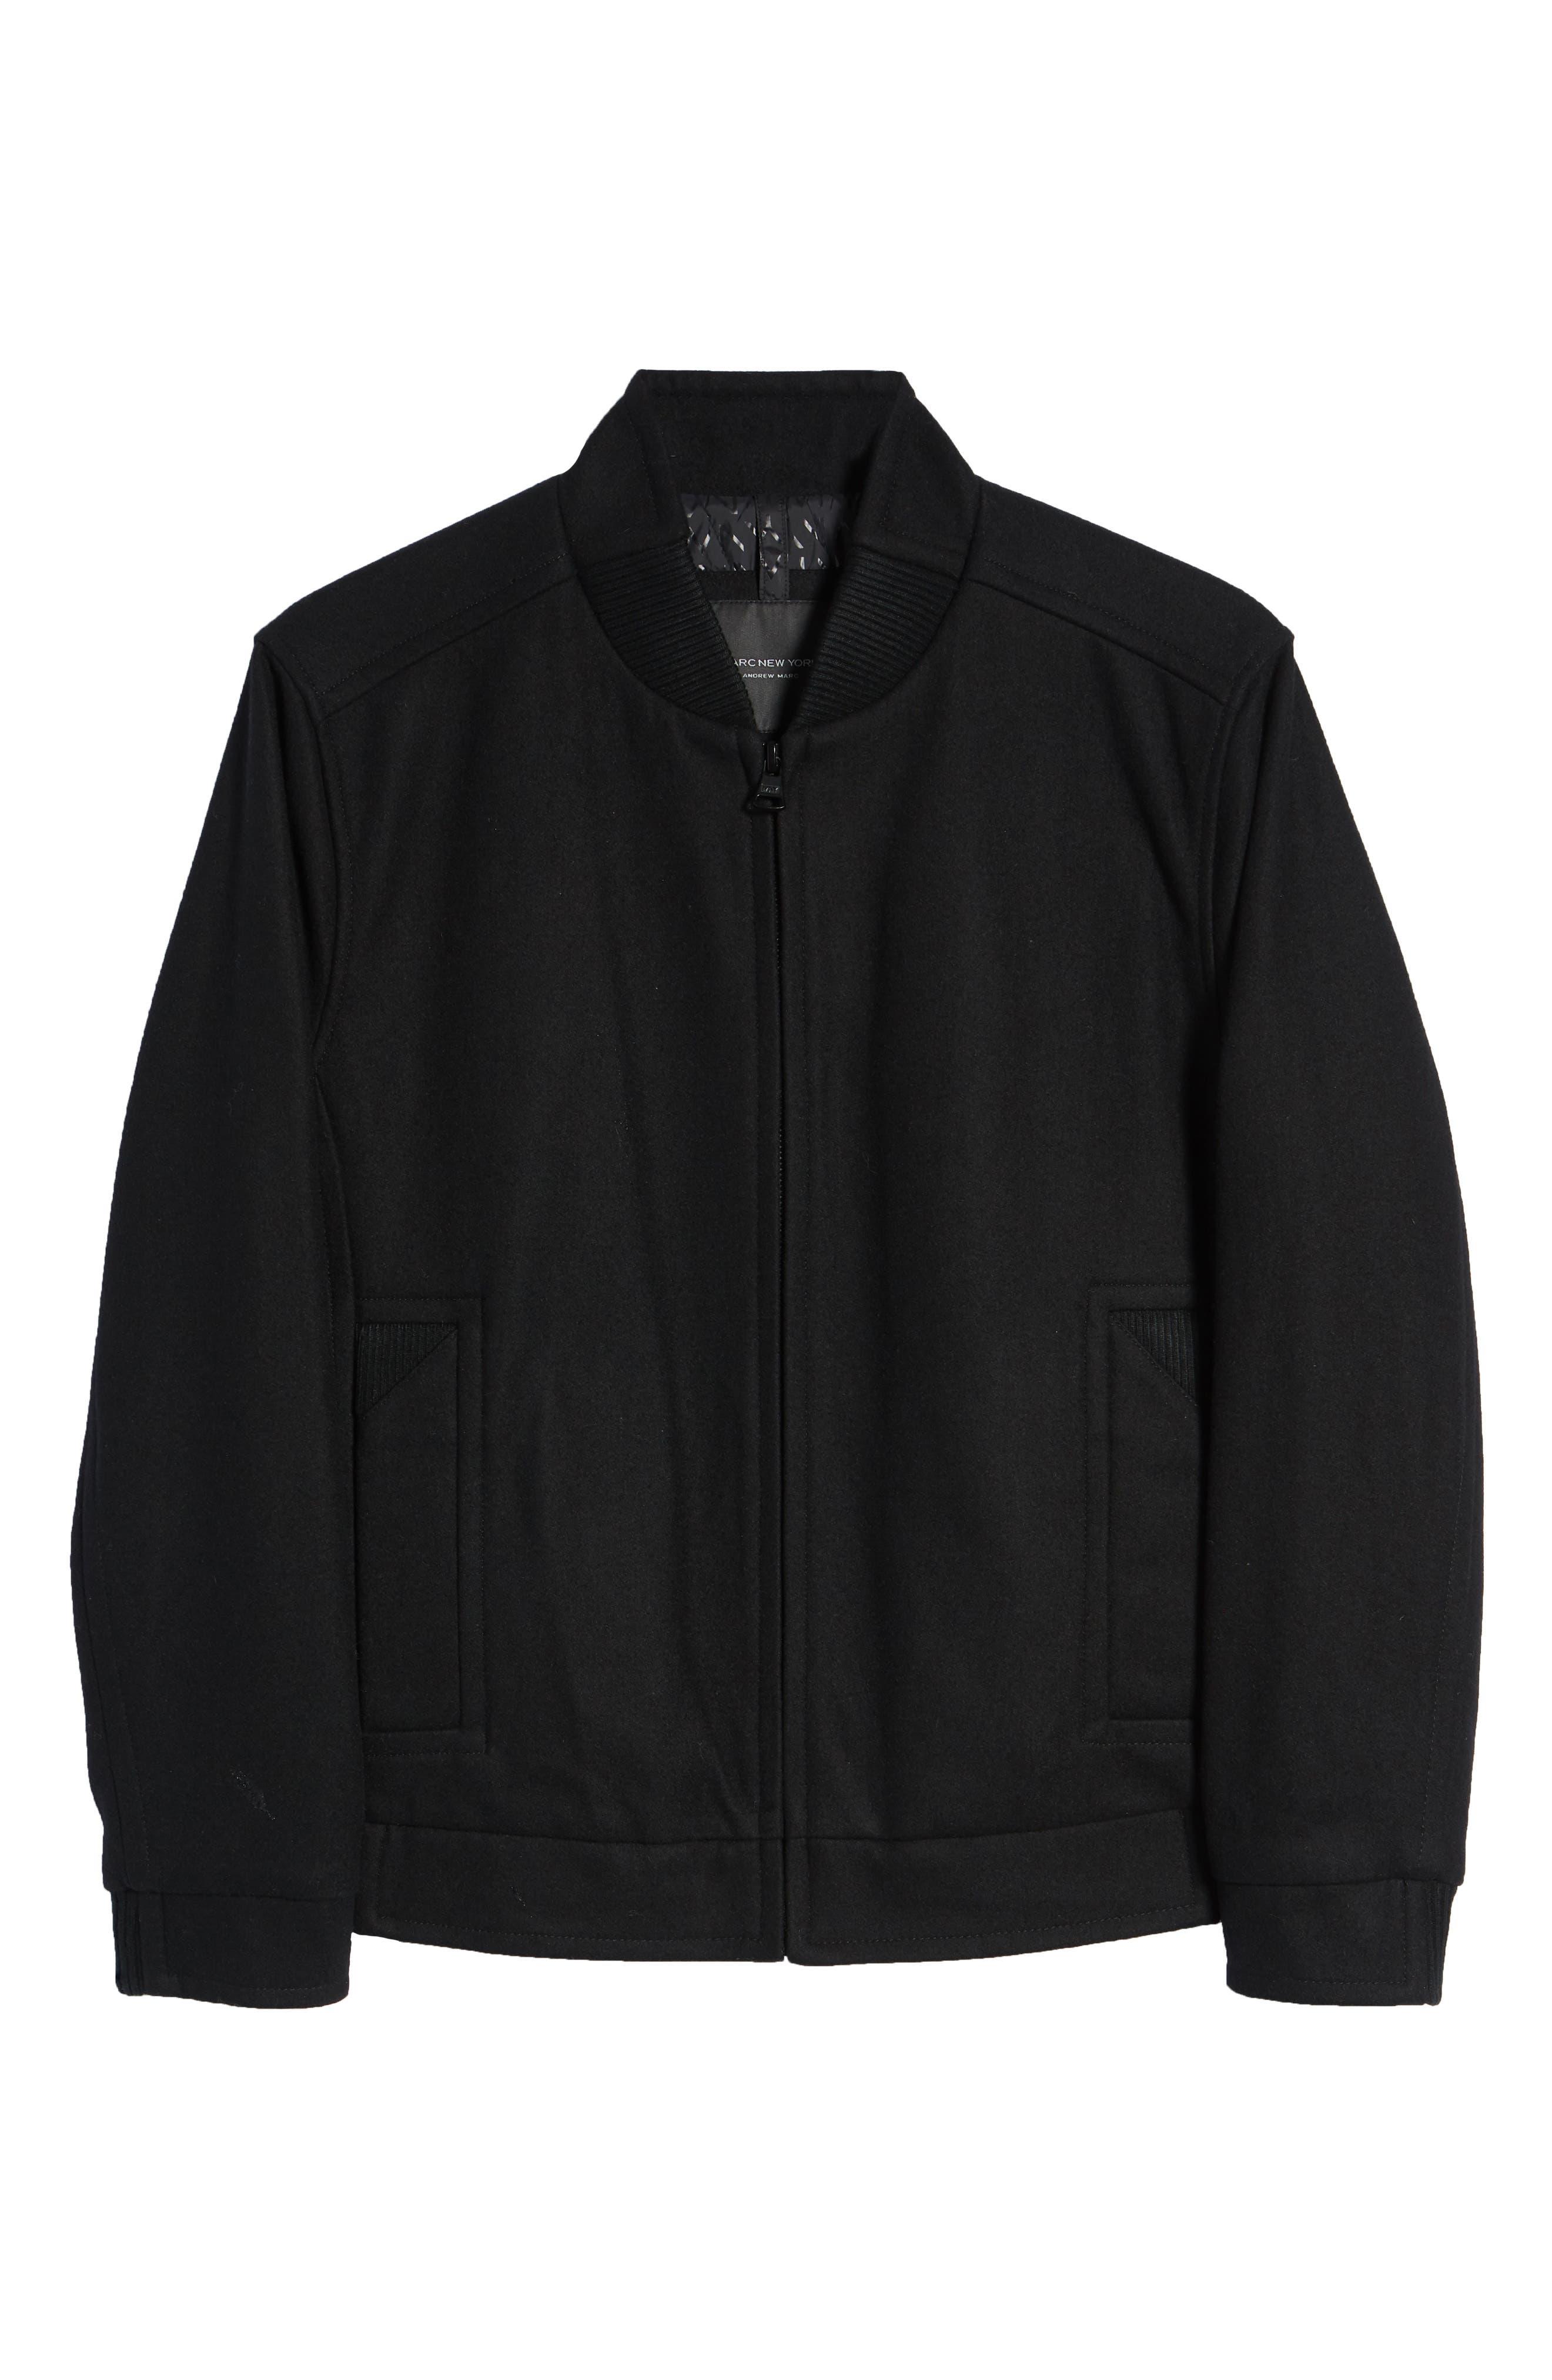 MARC NEW YORK, Barlow Wool Blend Bomber Jacket, Alternate thumbnail 6, color, 001